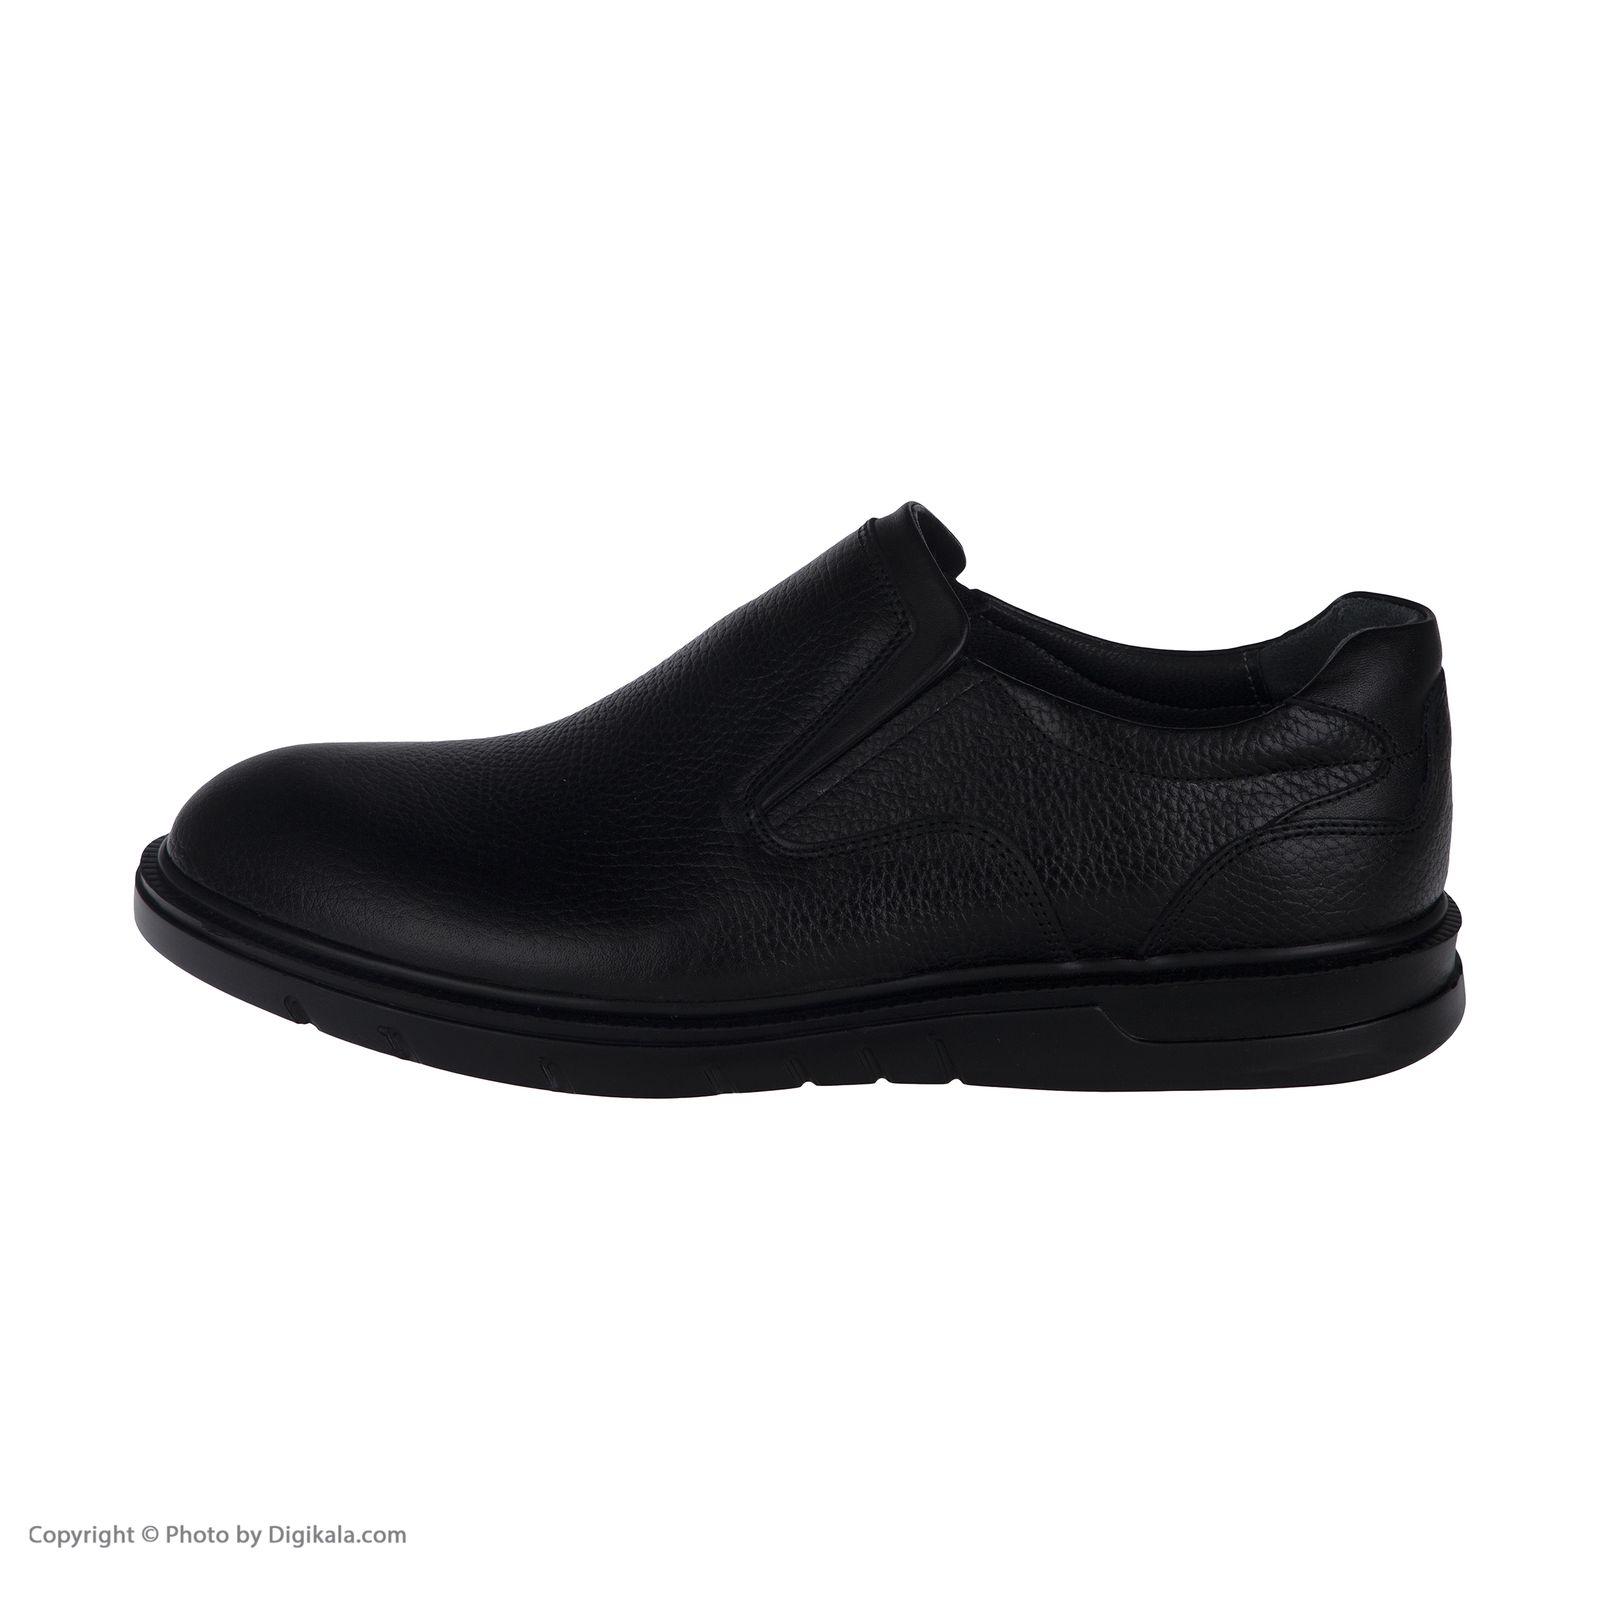 کفش روزمره مردانه بلوط مدل 7240C503101 -  - 3